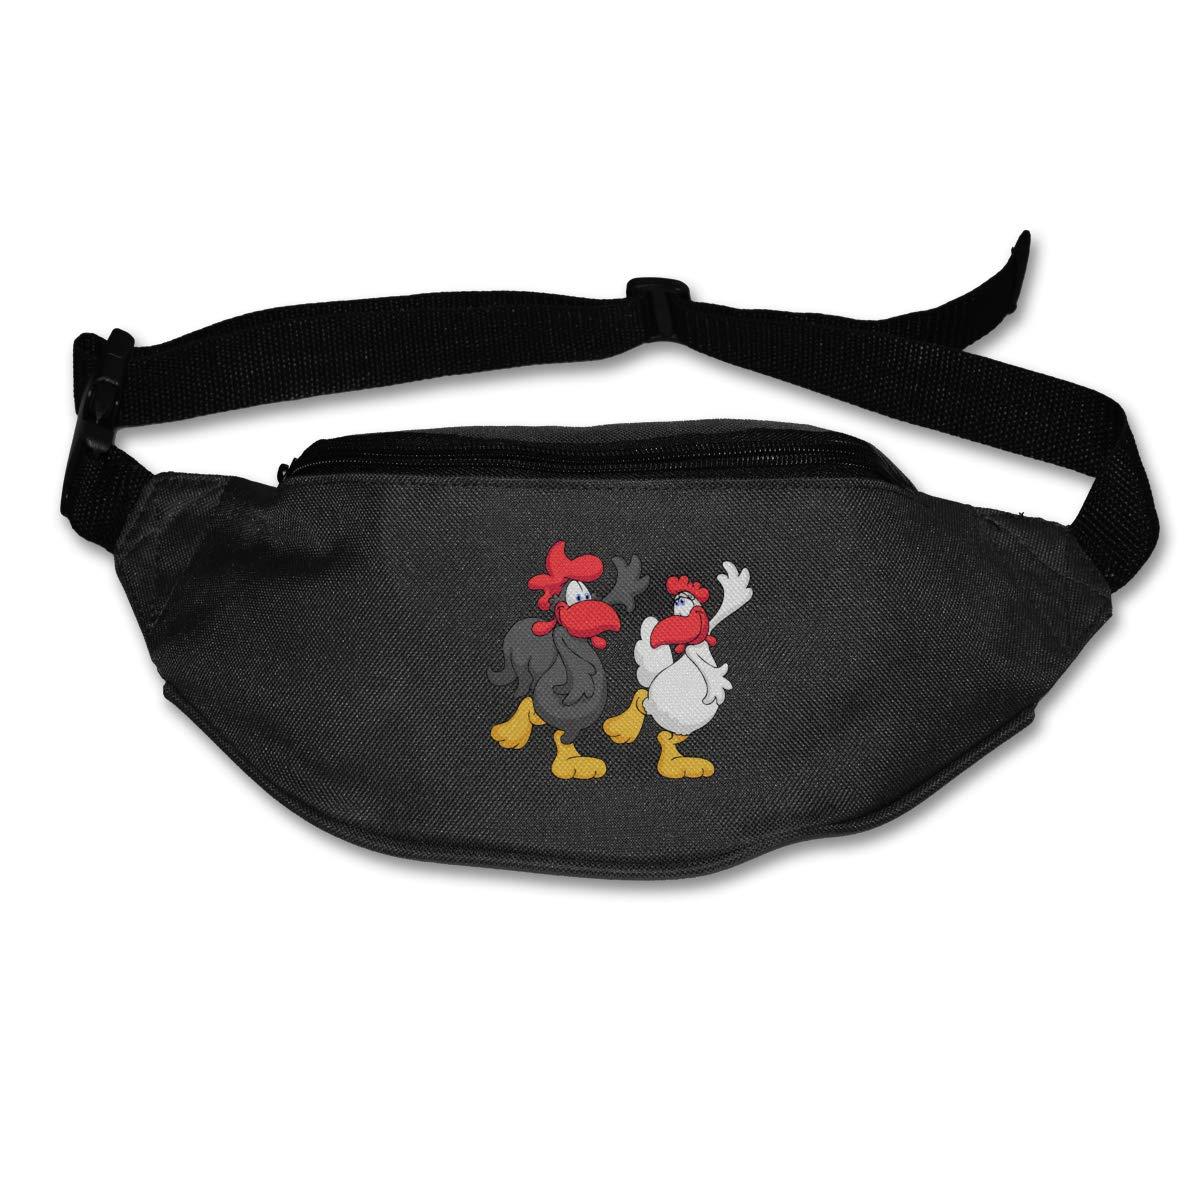 Dancing Hen Rooster Sport Waist Bag Fanny Pack Adjustable For Run